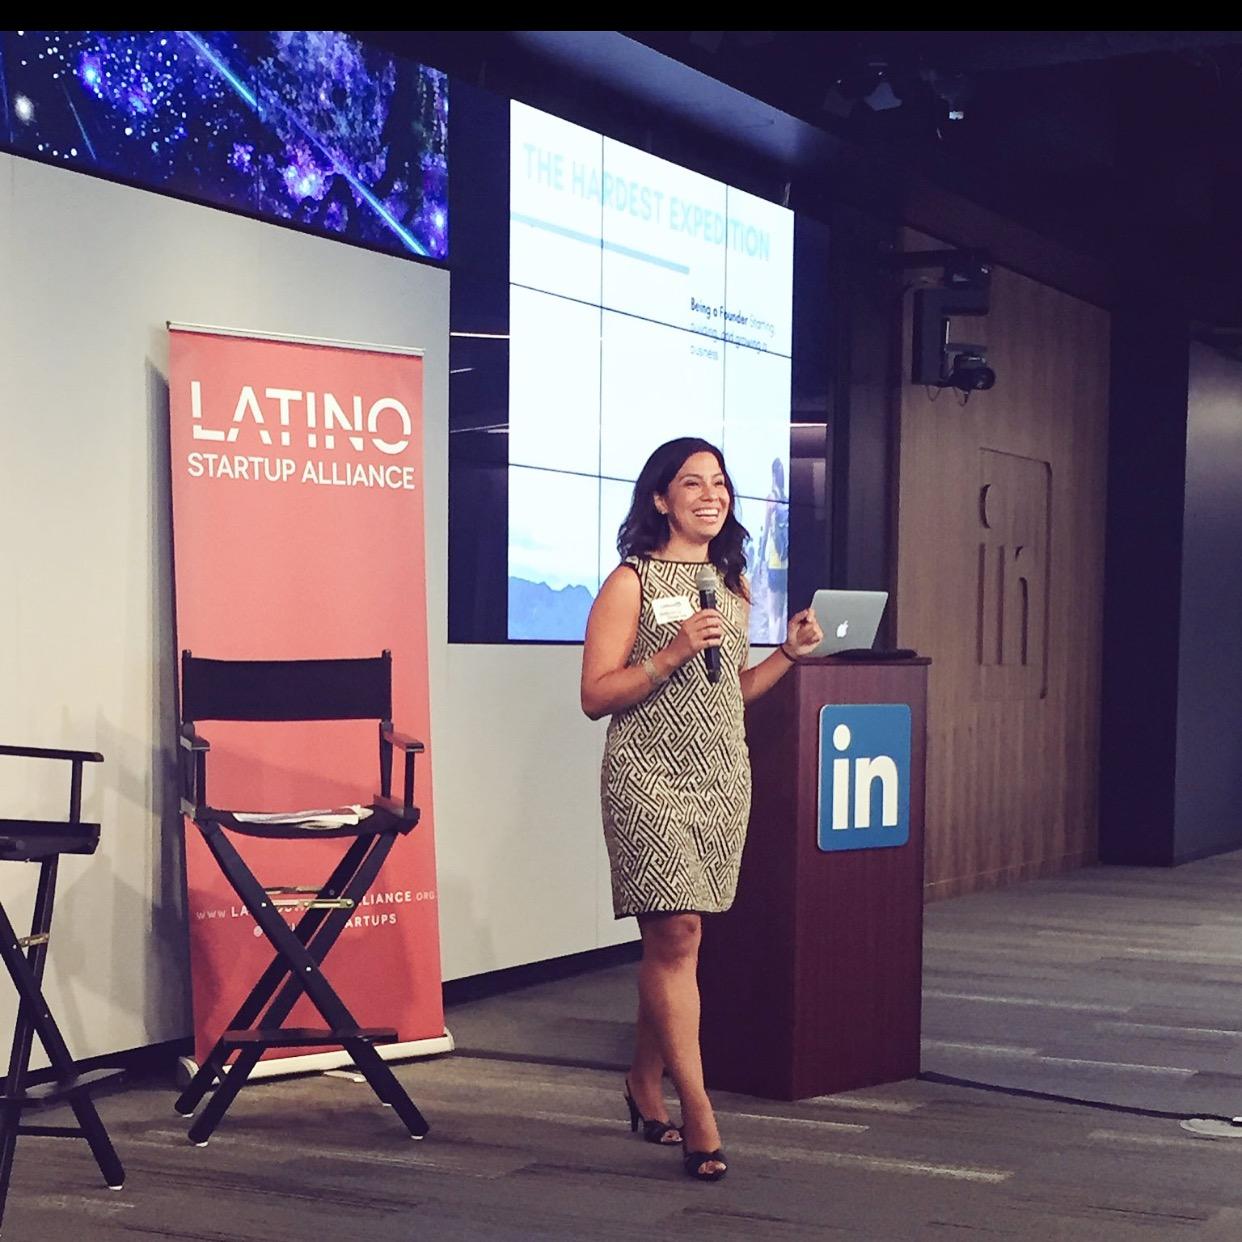 Georgina speaking at LinkedIn at the America's Summit in San Francisco